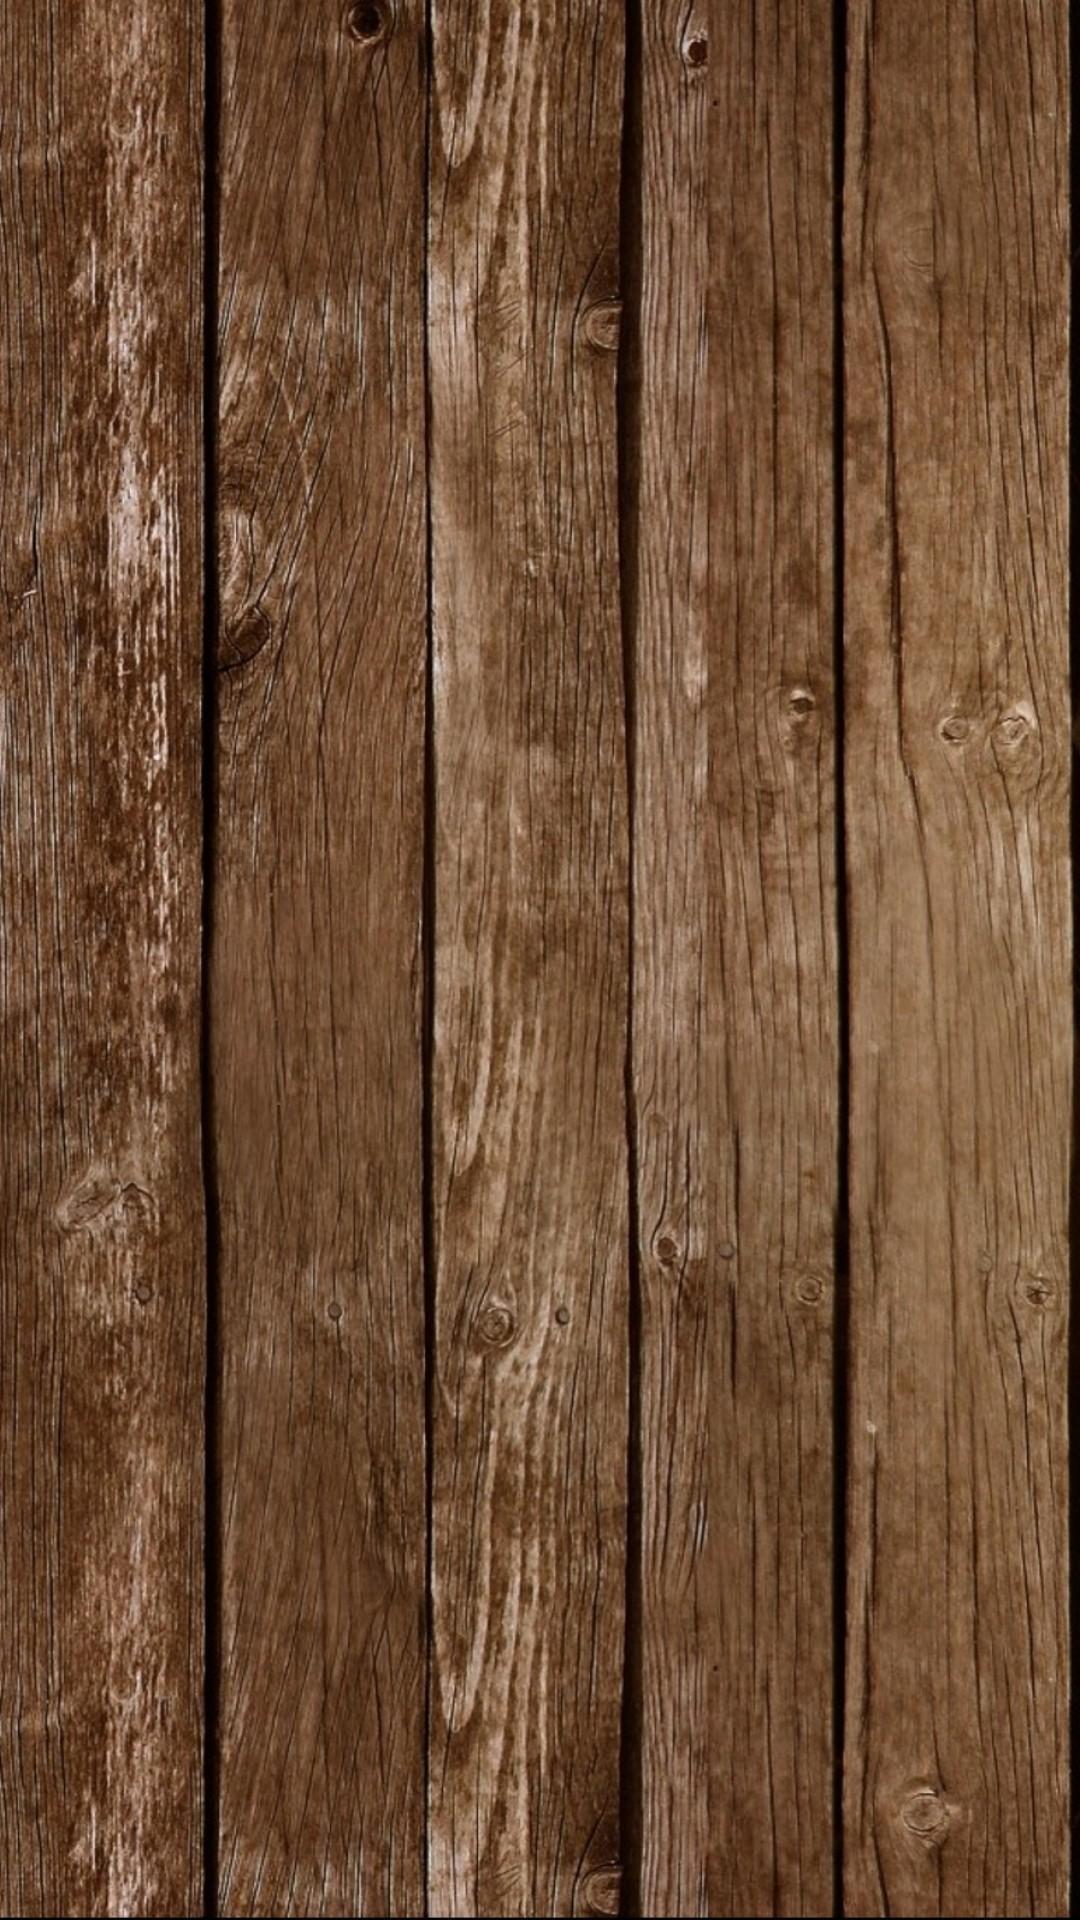 Wood iphone home screen wallpaper